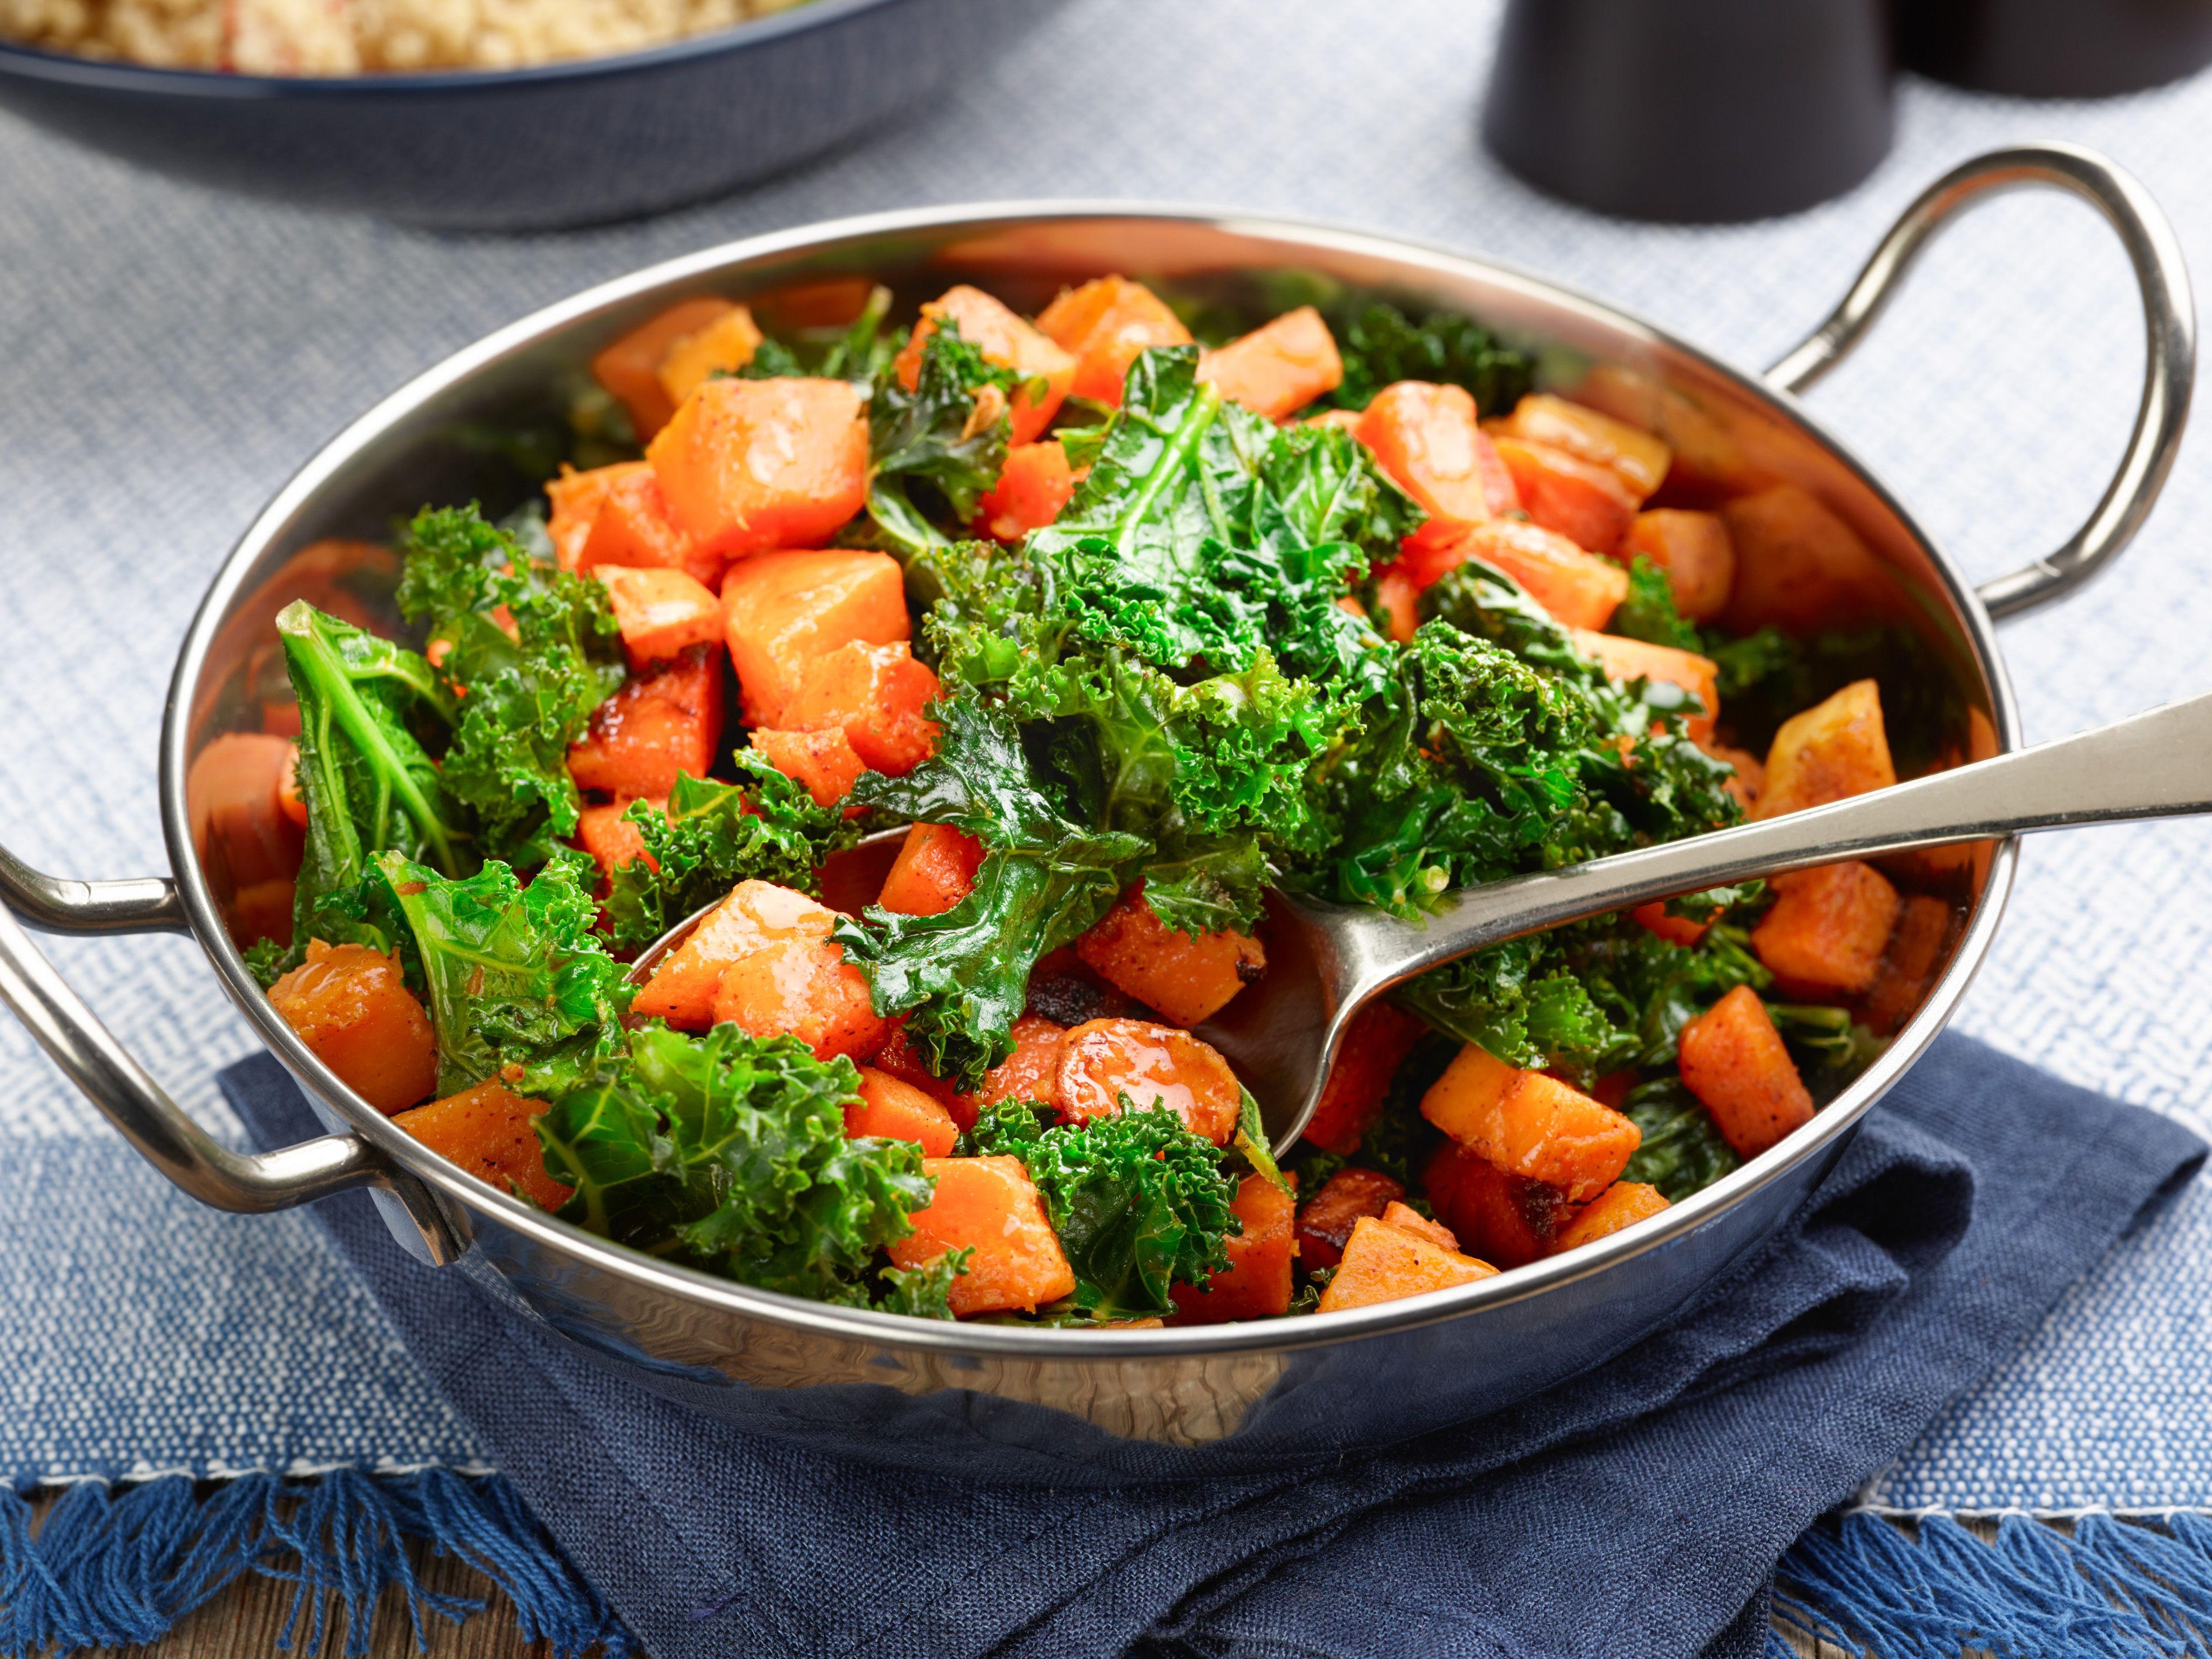 Ernut Squash And Kale Stir Fry